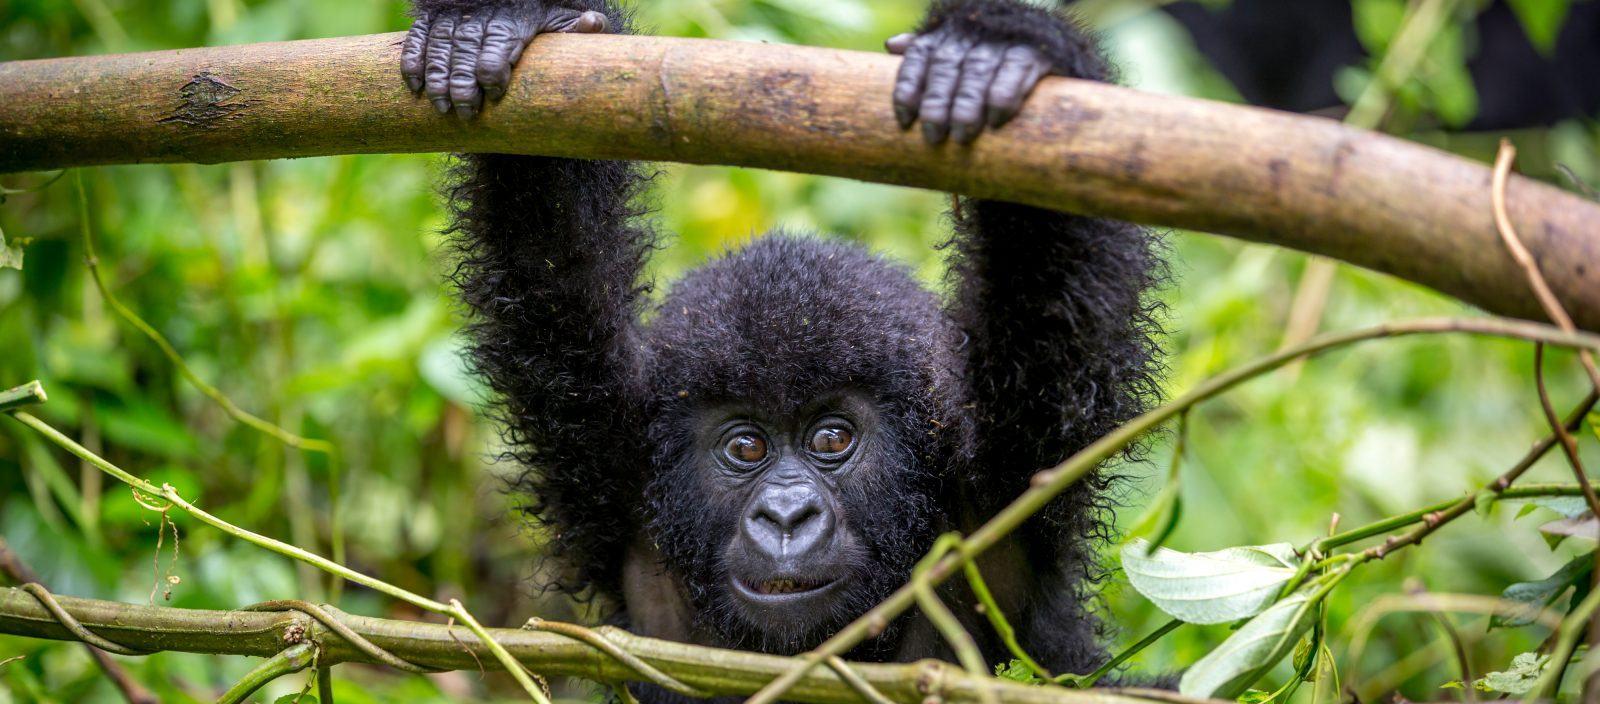 The Great Apes of Uganda and Rwanda